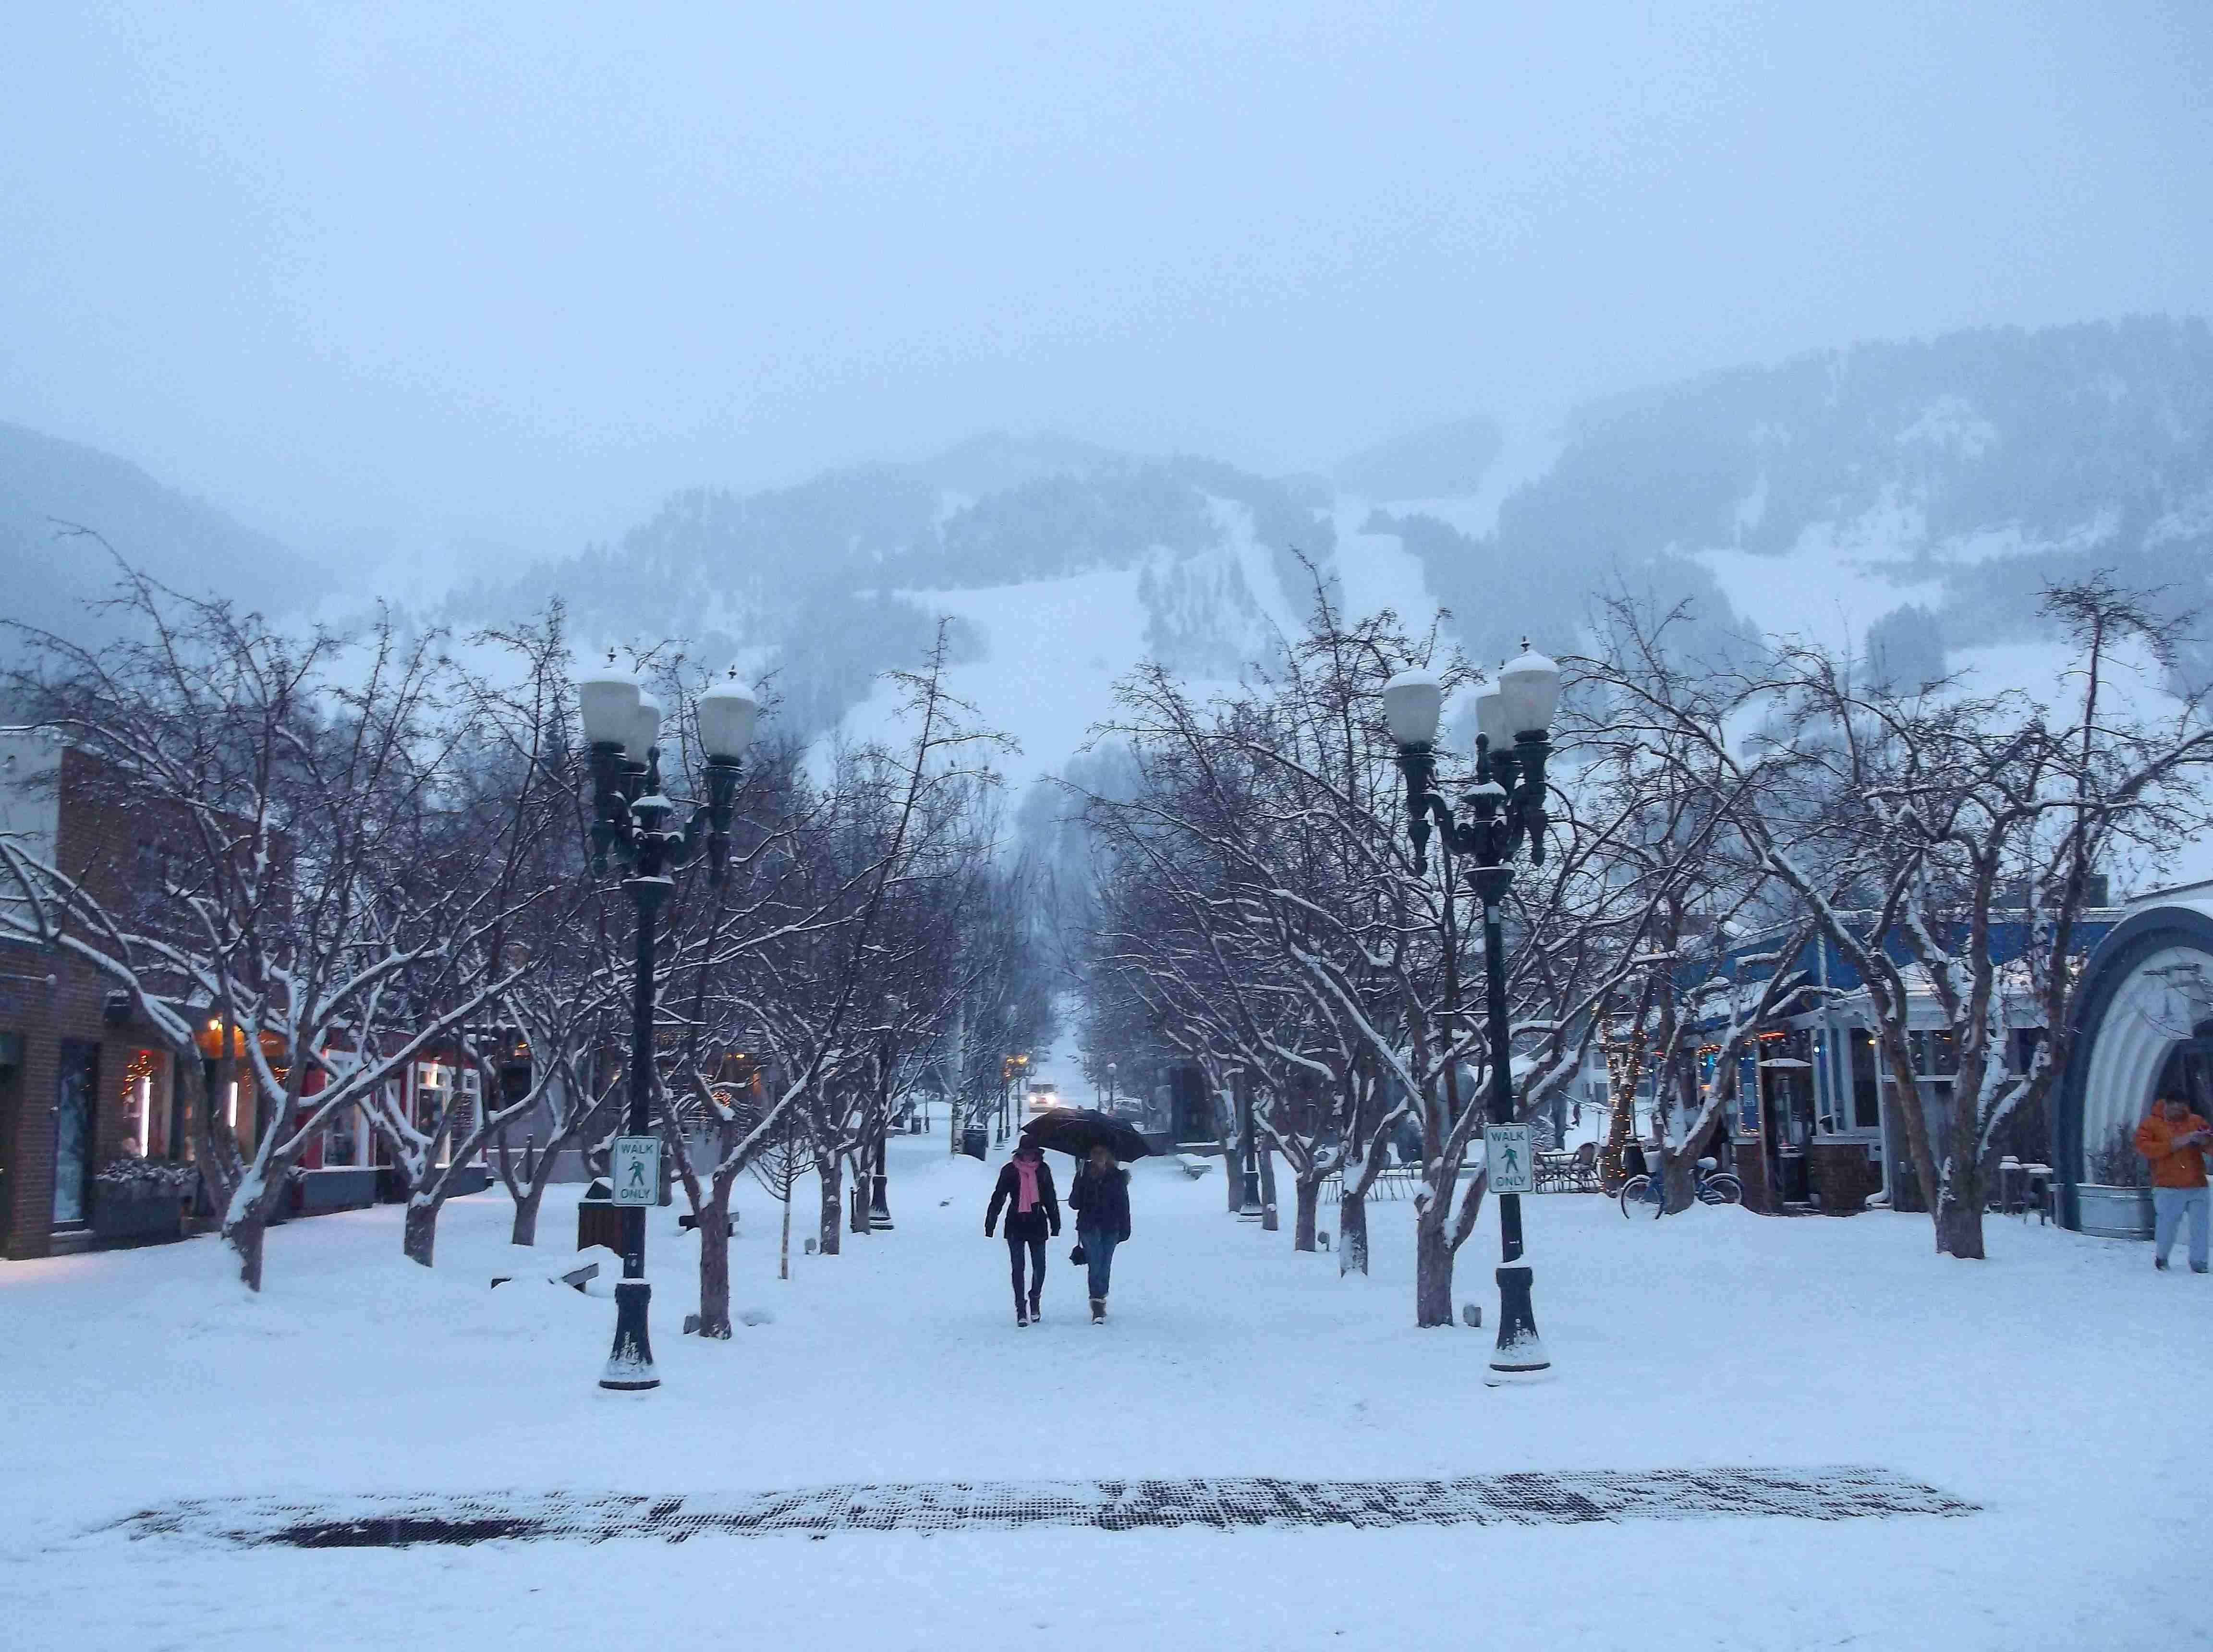 Aspen's Mall in snow